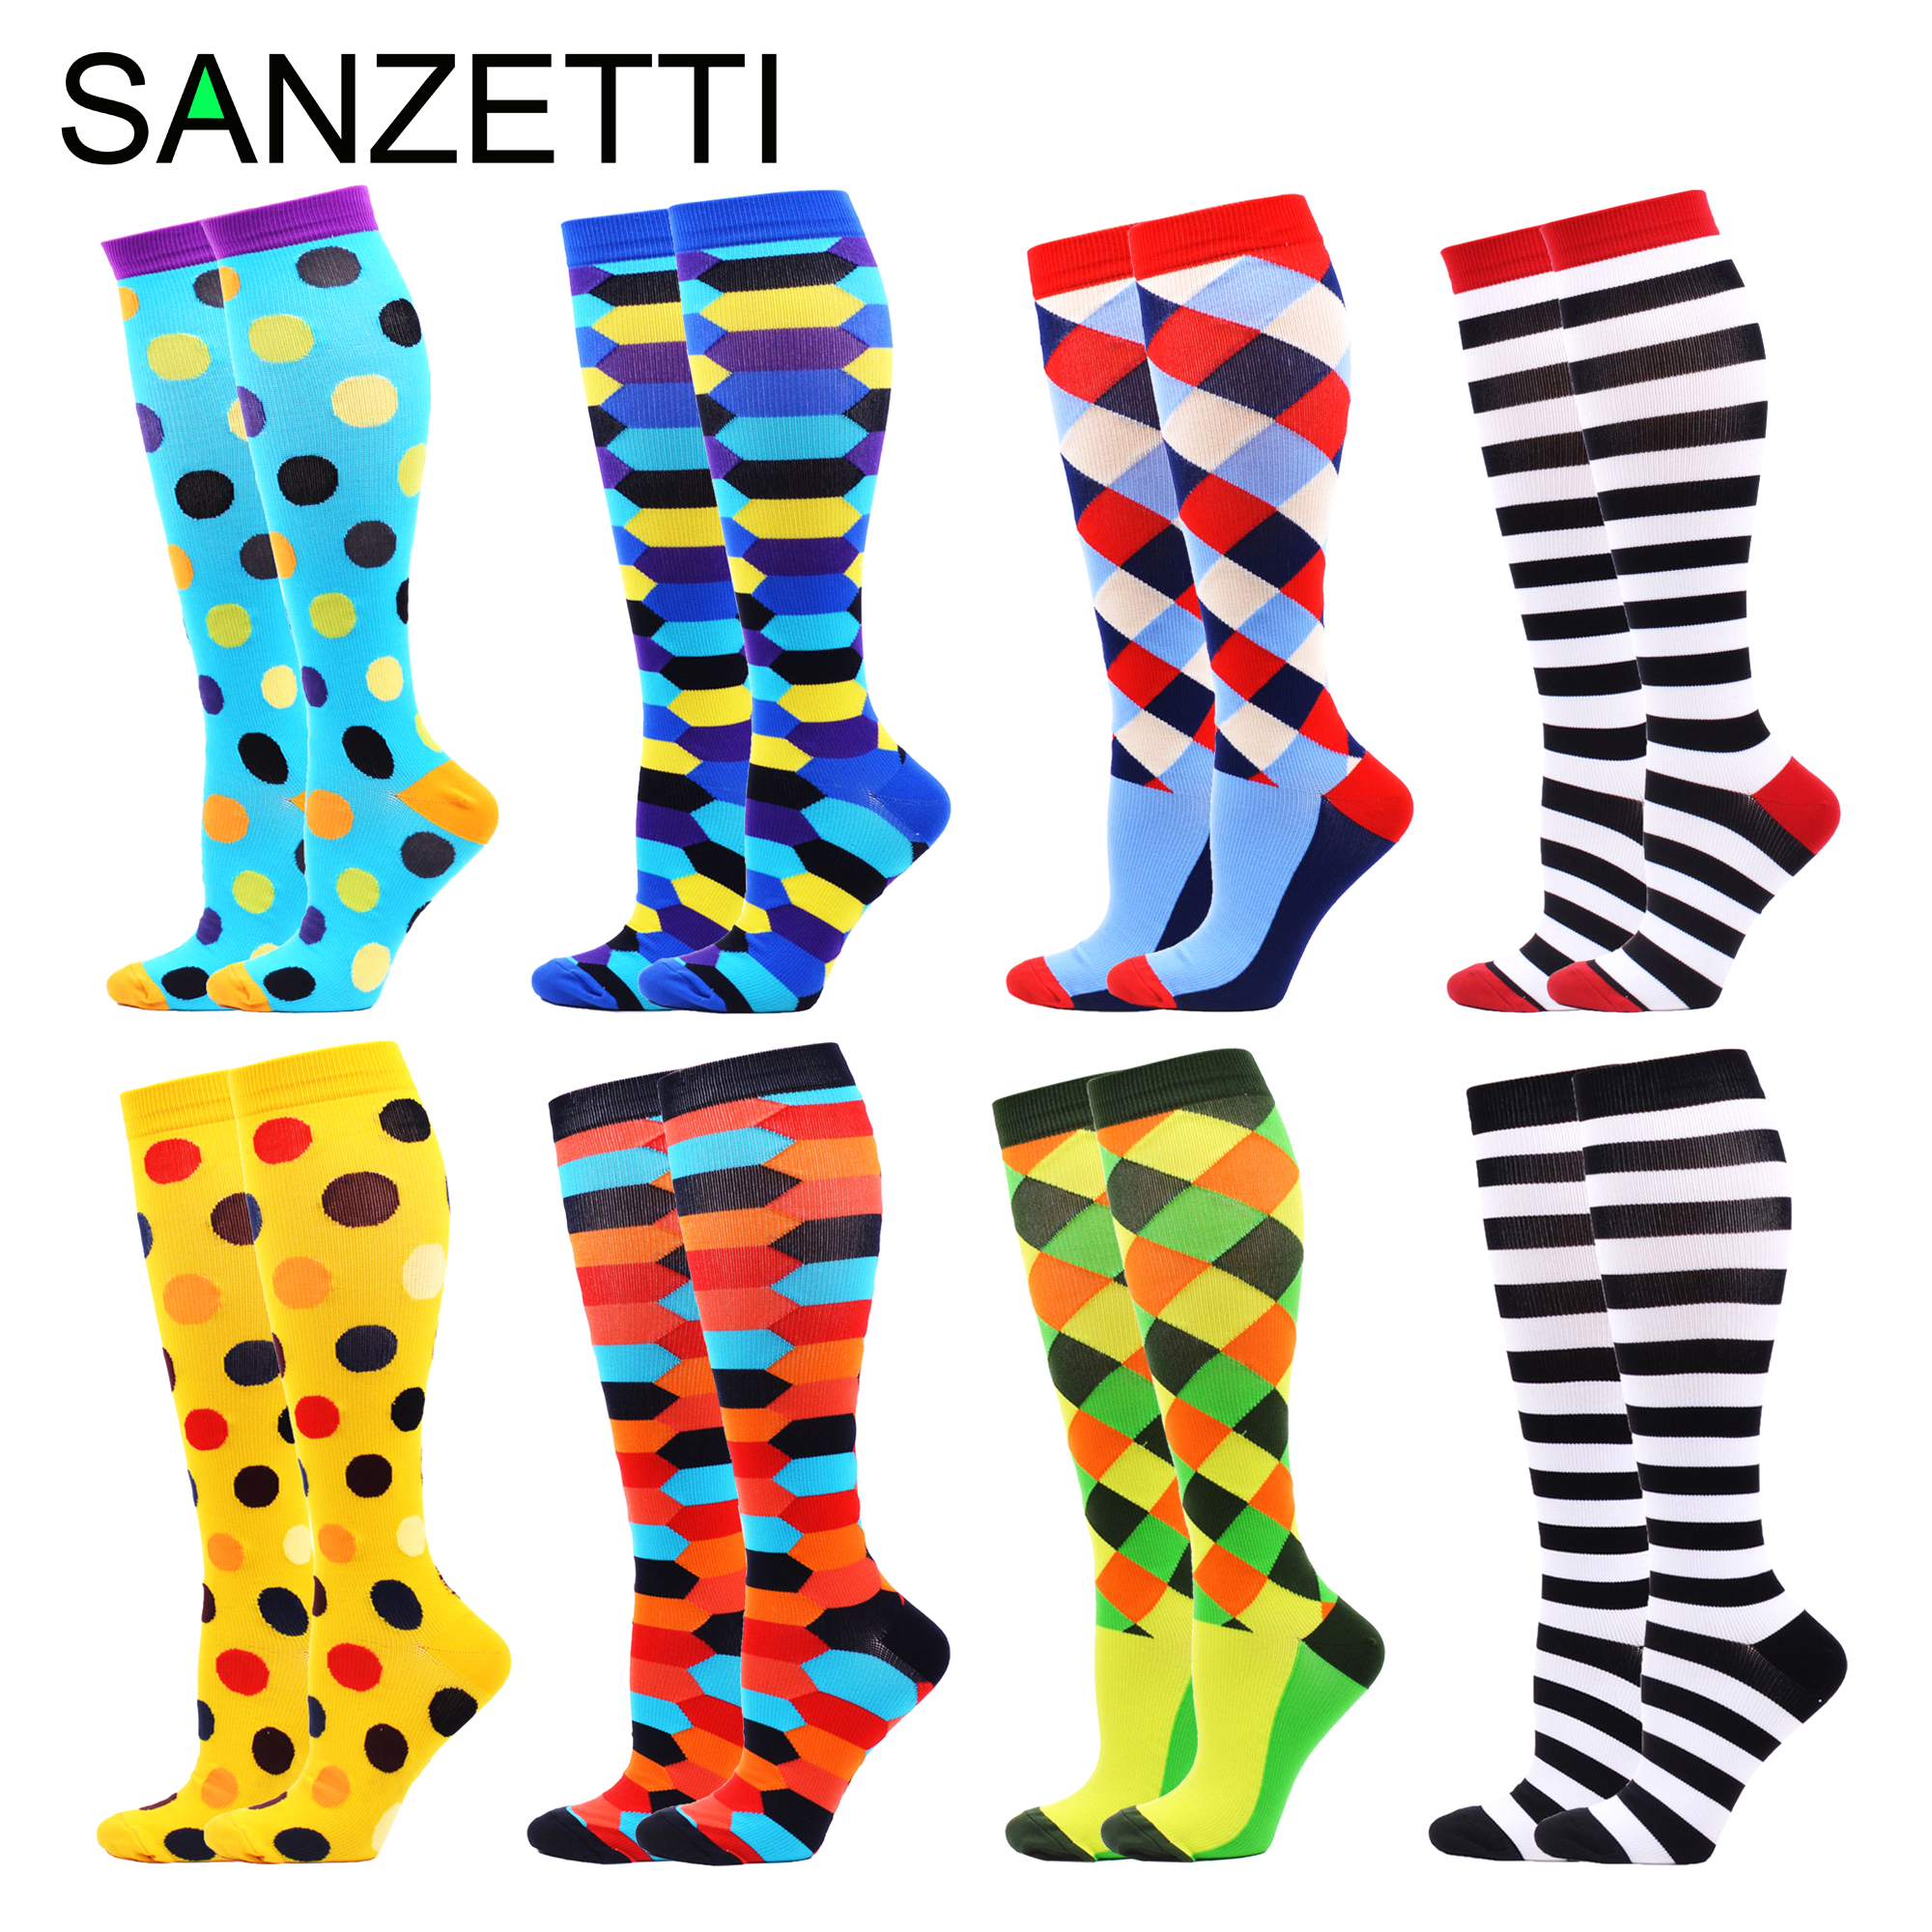 SANZETTI 8 Pairs Women's Colorful Stripe Leg Support Stretch Cotton Compression Socks Below Knee Anti-Fatigue Happy Sport Socks